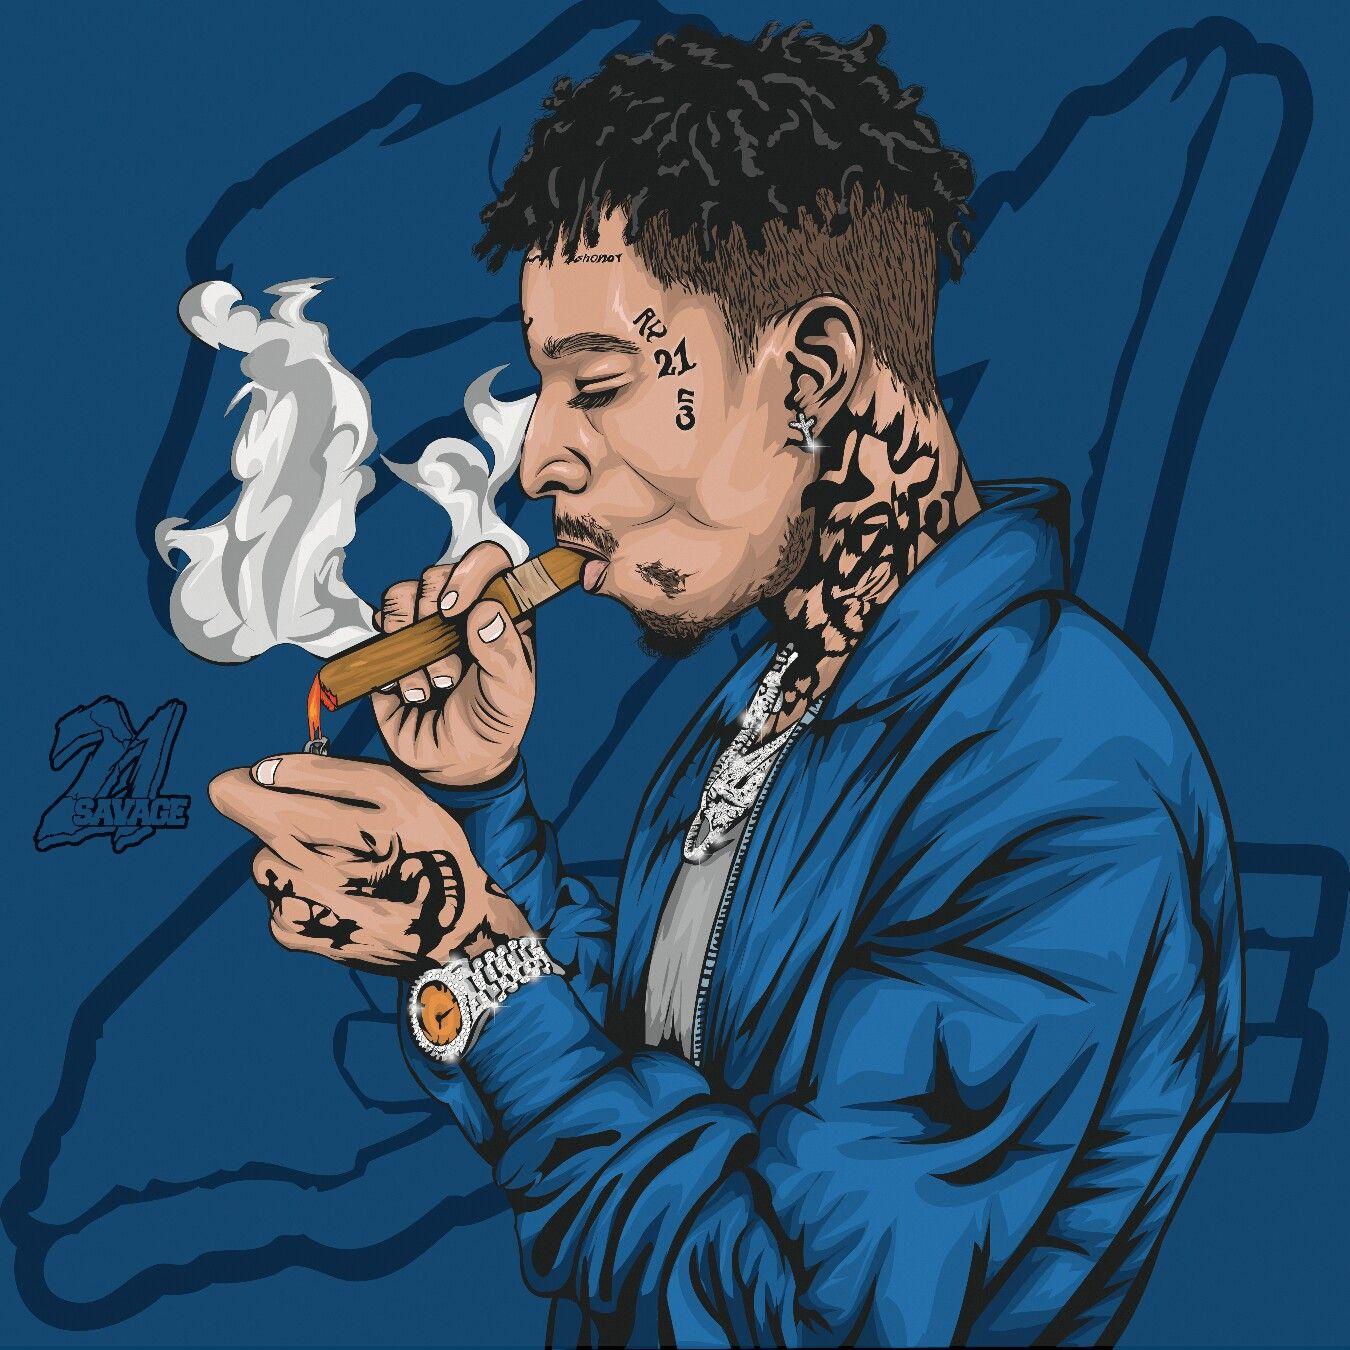 21 savage art by paulkawira rapper art swag art tupac art 21 savage art by paulkawira rapper